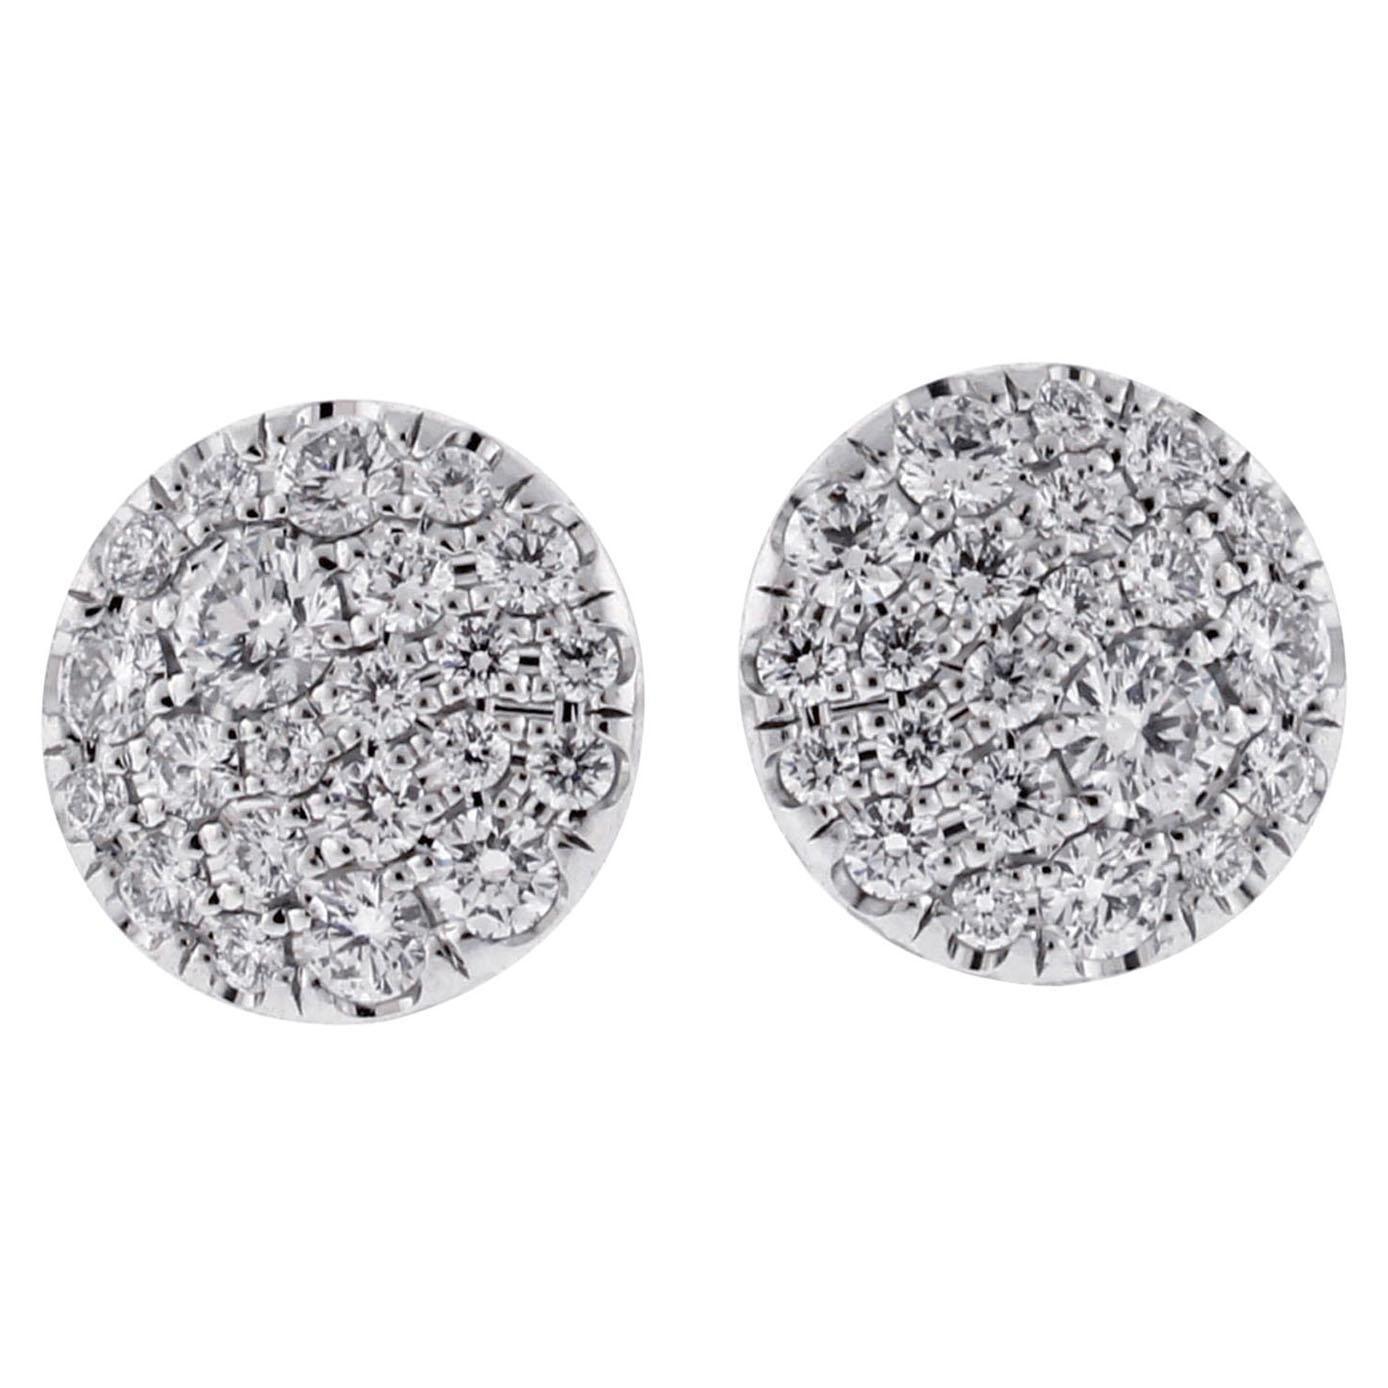 Tiffany & Co Metro Diamond Stud Earrings